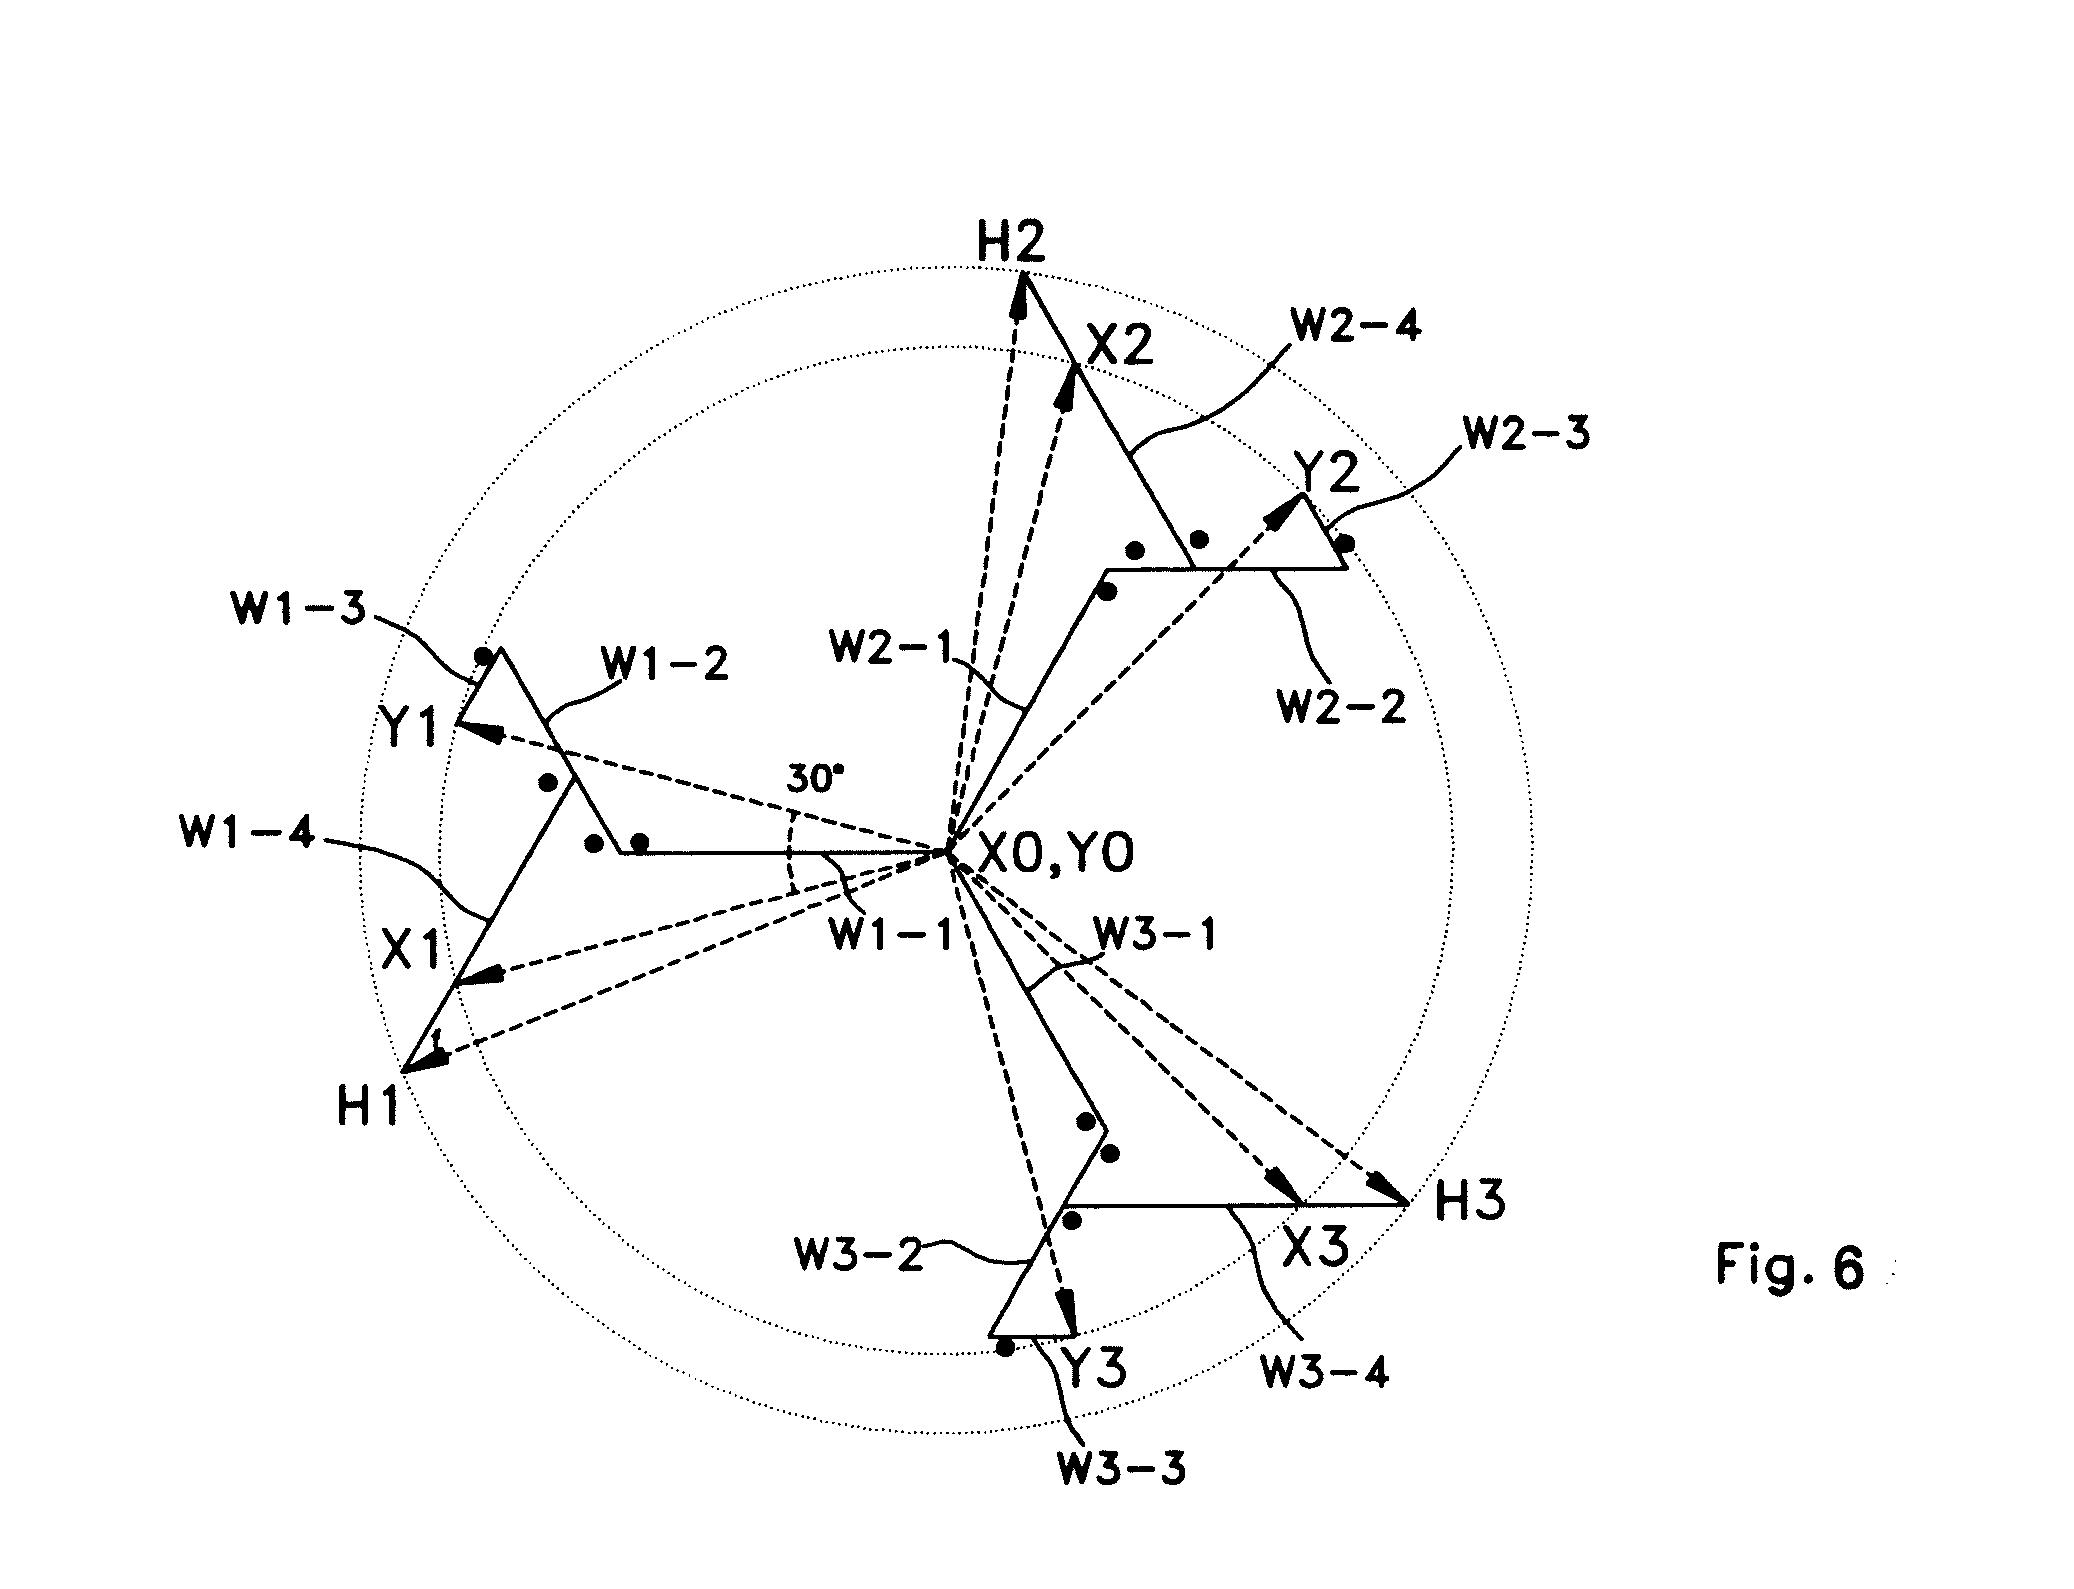 3 Phase Delta Transformer Wiring Diagram on 120v Transformer Diagram 480 240